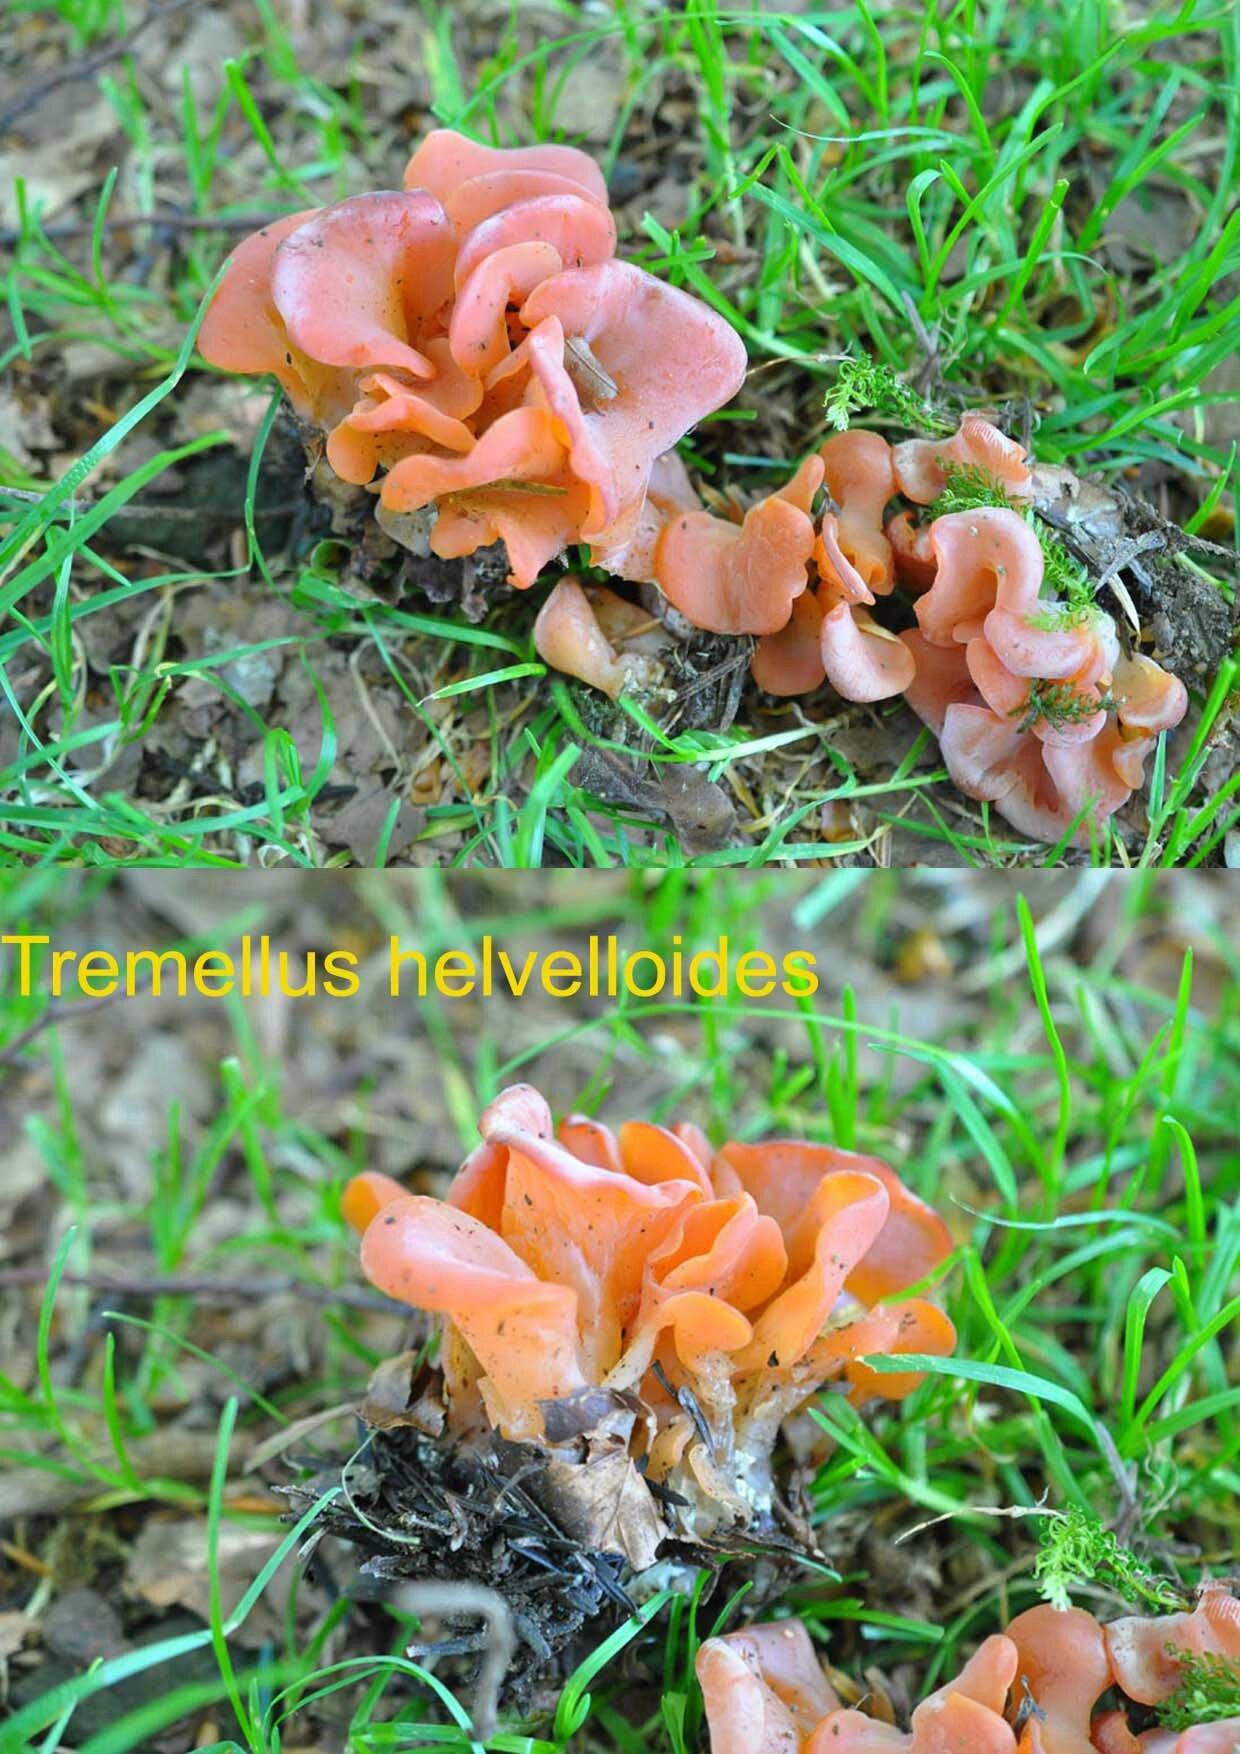 Tremellus helvelloides